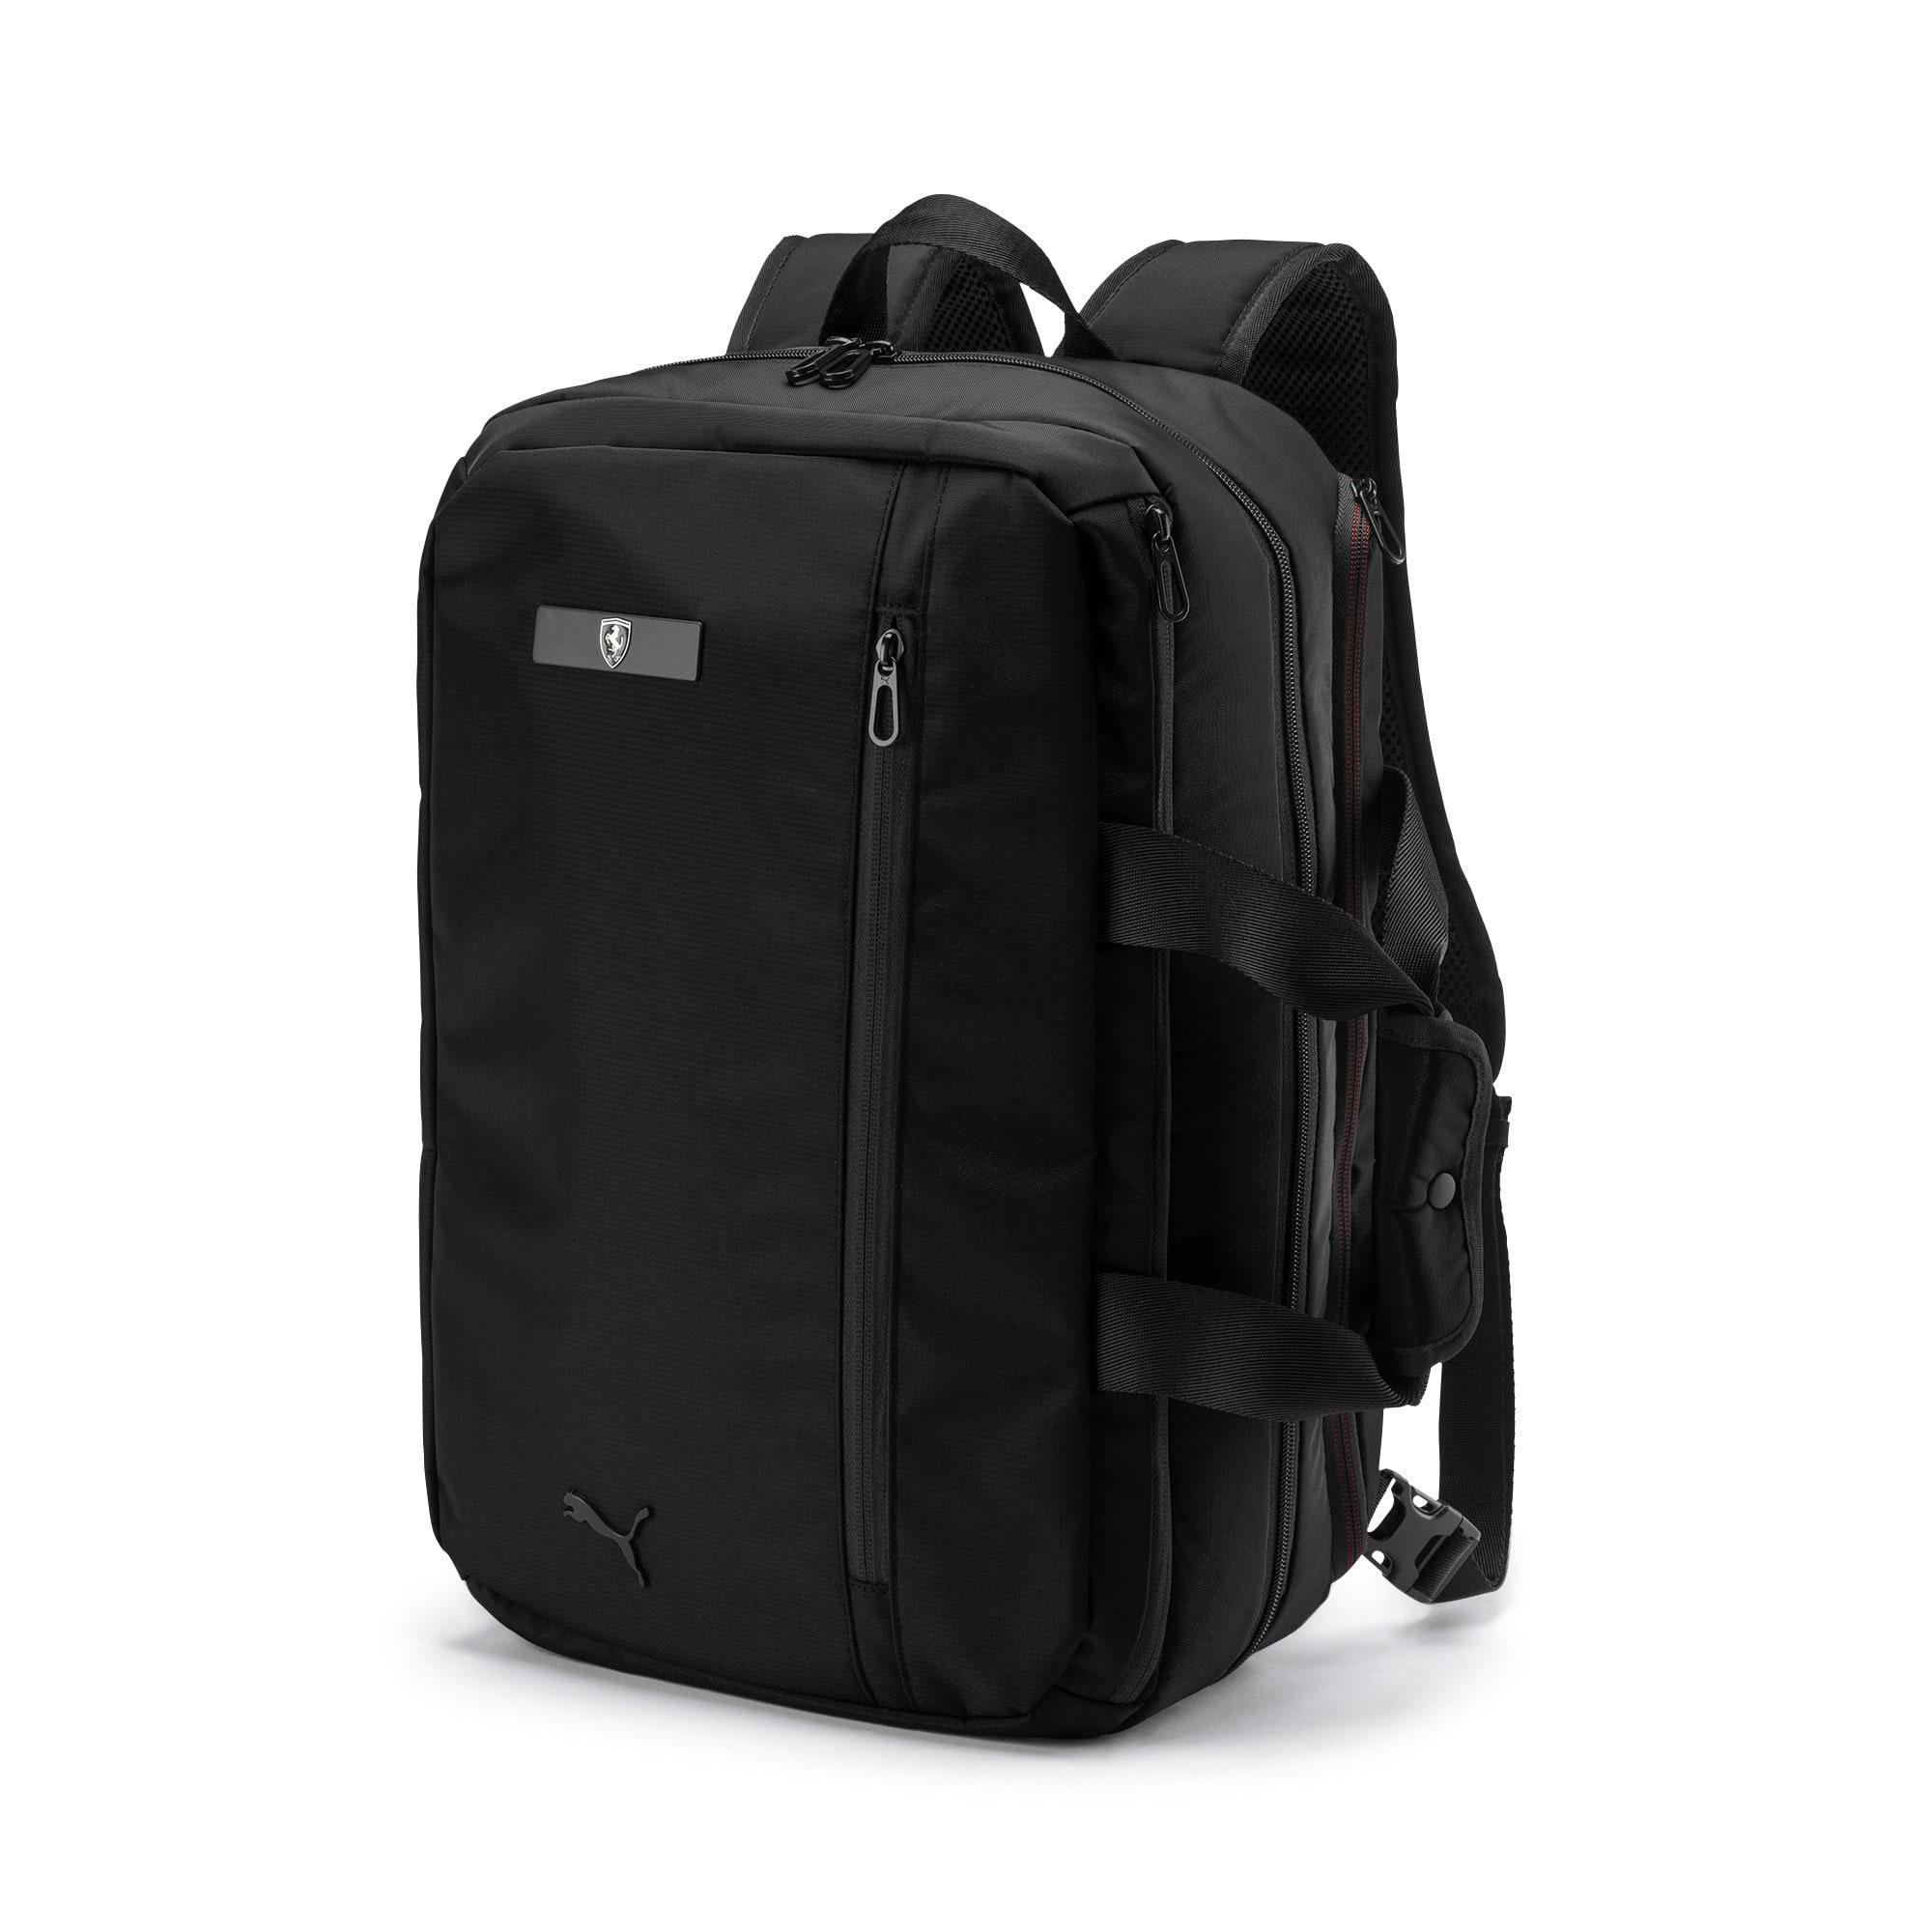 Thumbnail 1 of Ferrari Lifestyle RCT Backpack, Puma Black, medium-IND